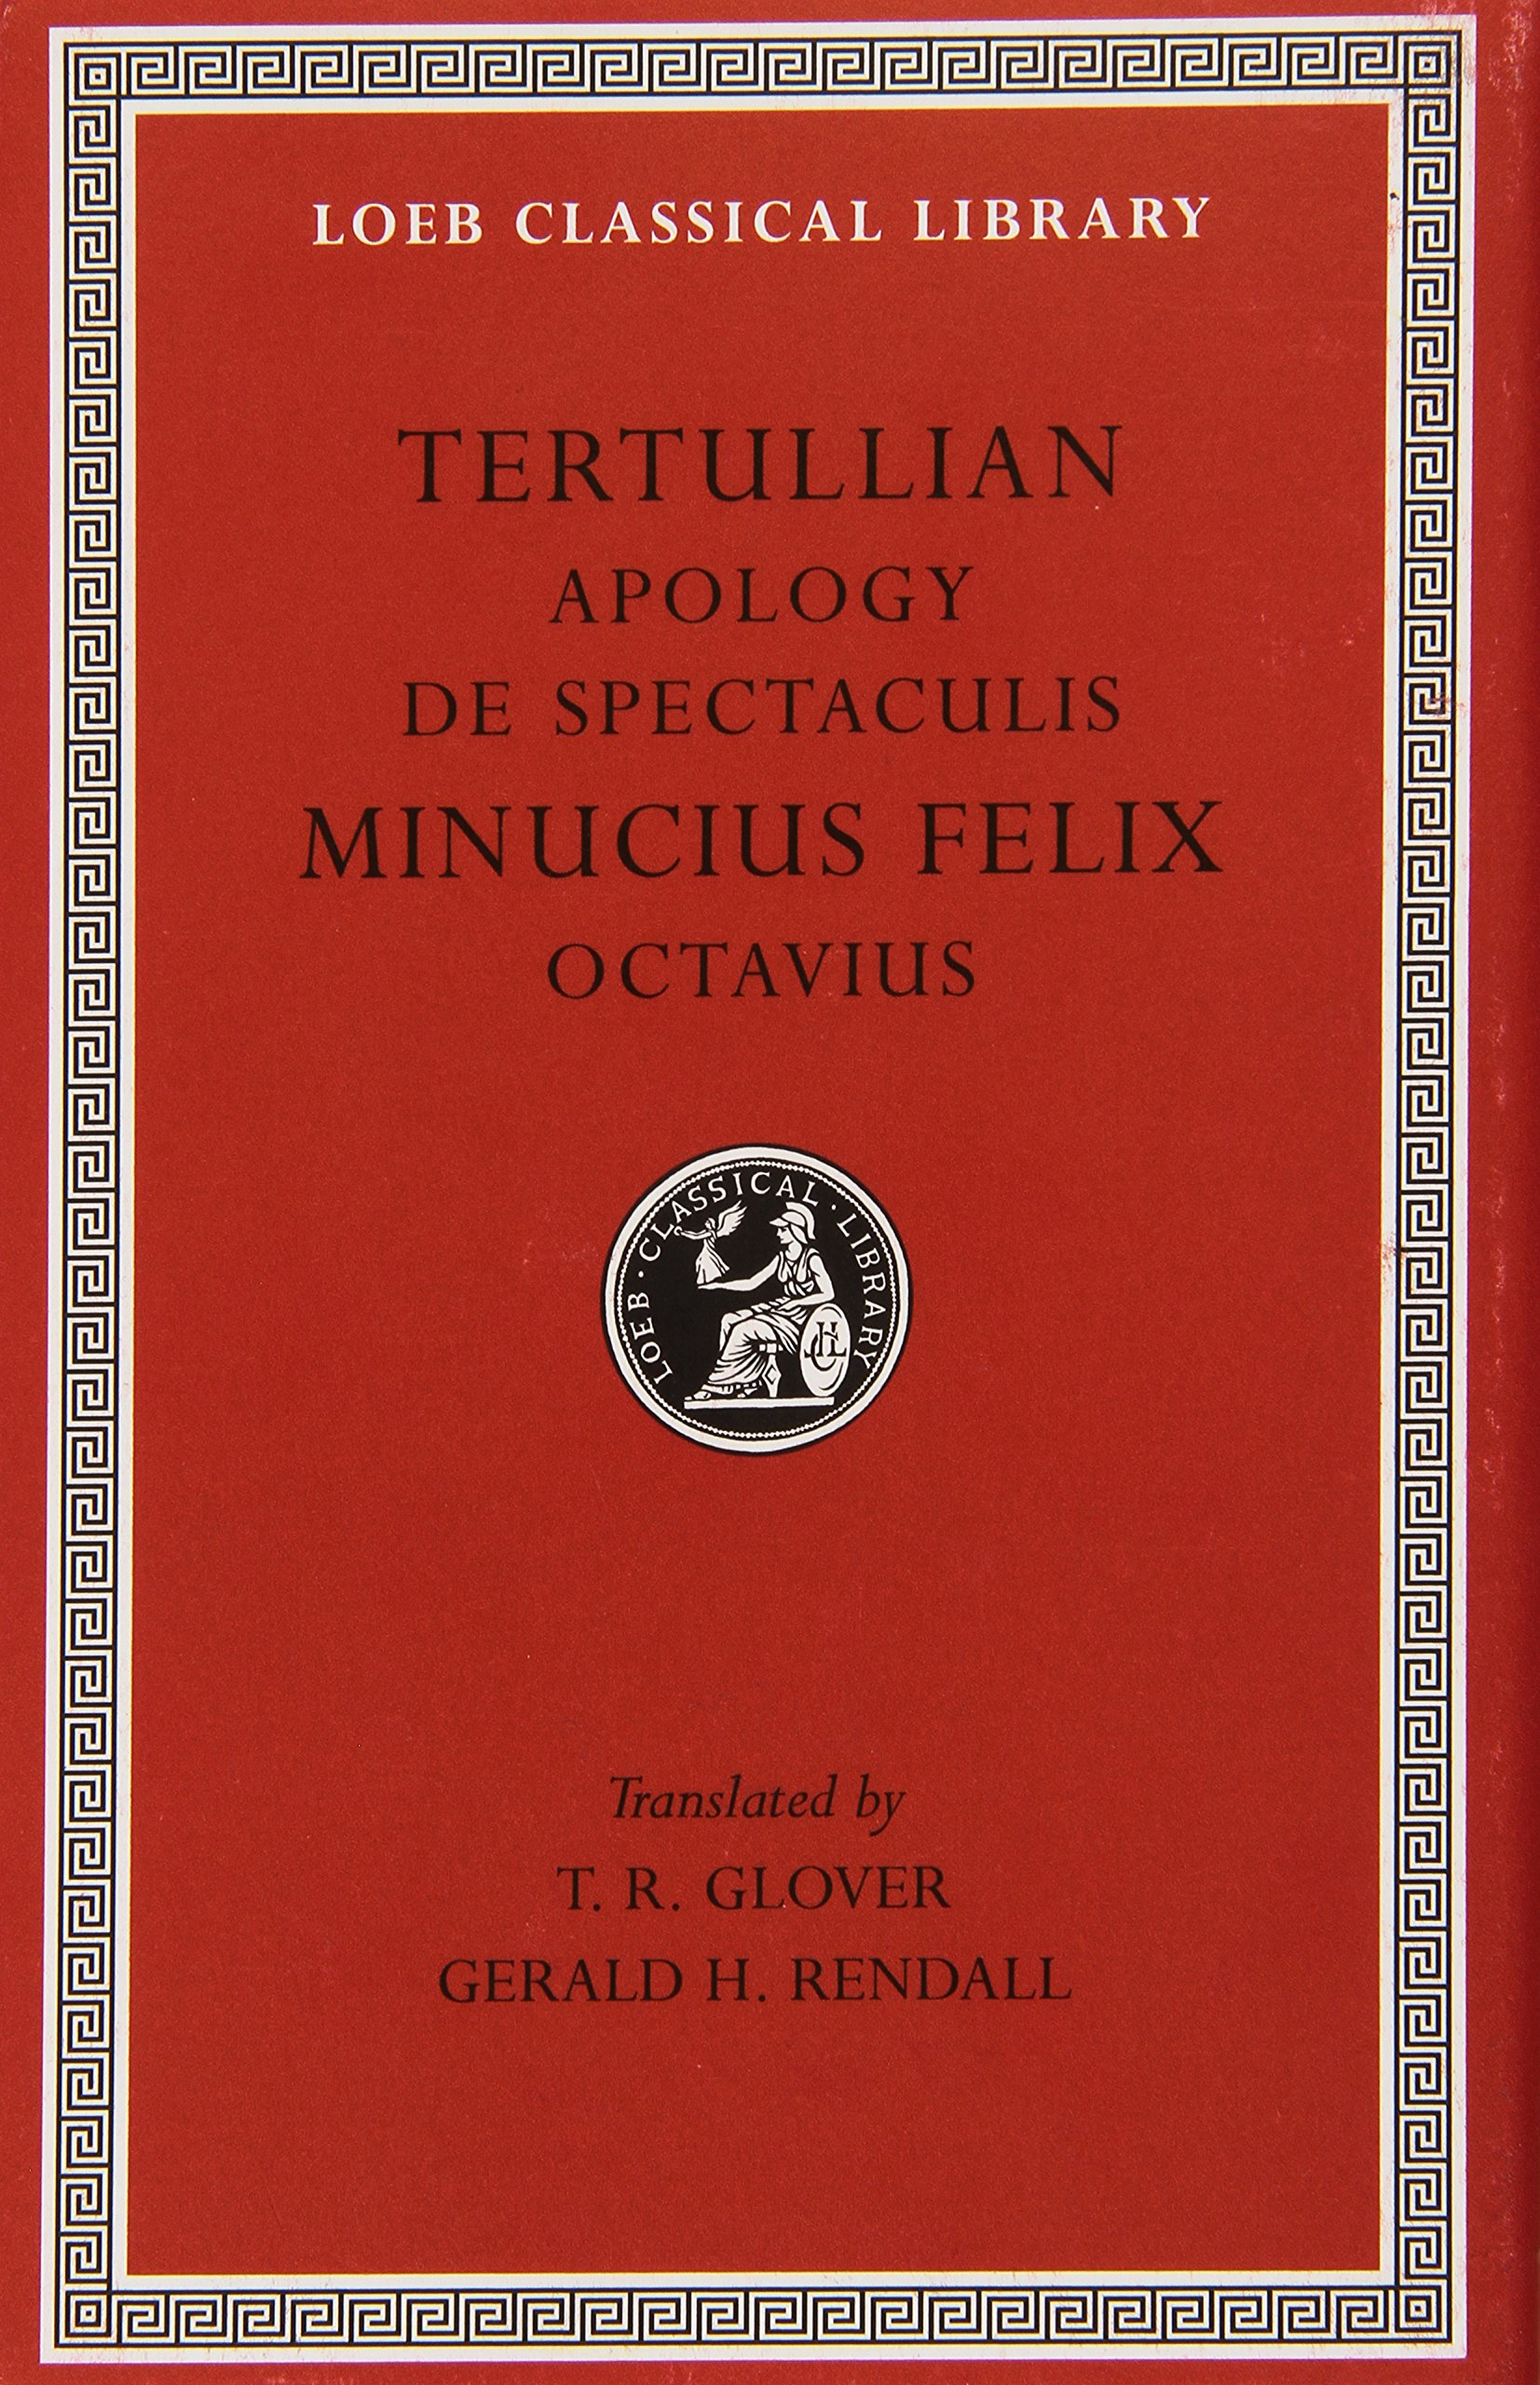 Tertullian: Apology and De Spectaculis. Minucius Felix: Octavius (Loeb Classical Library No. 250) (English and Latin Edition) by Harvard University Press